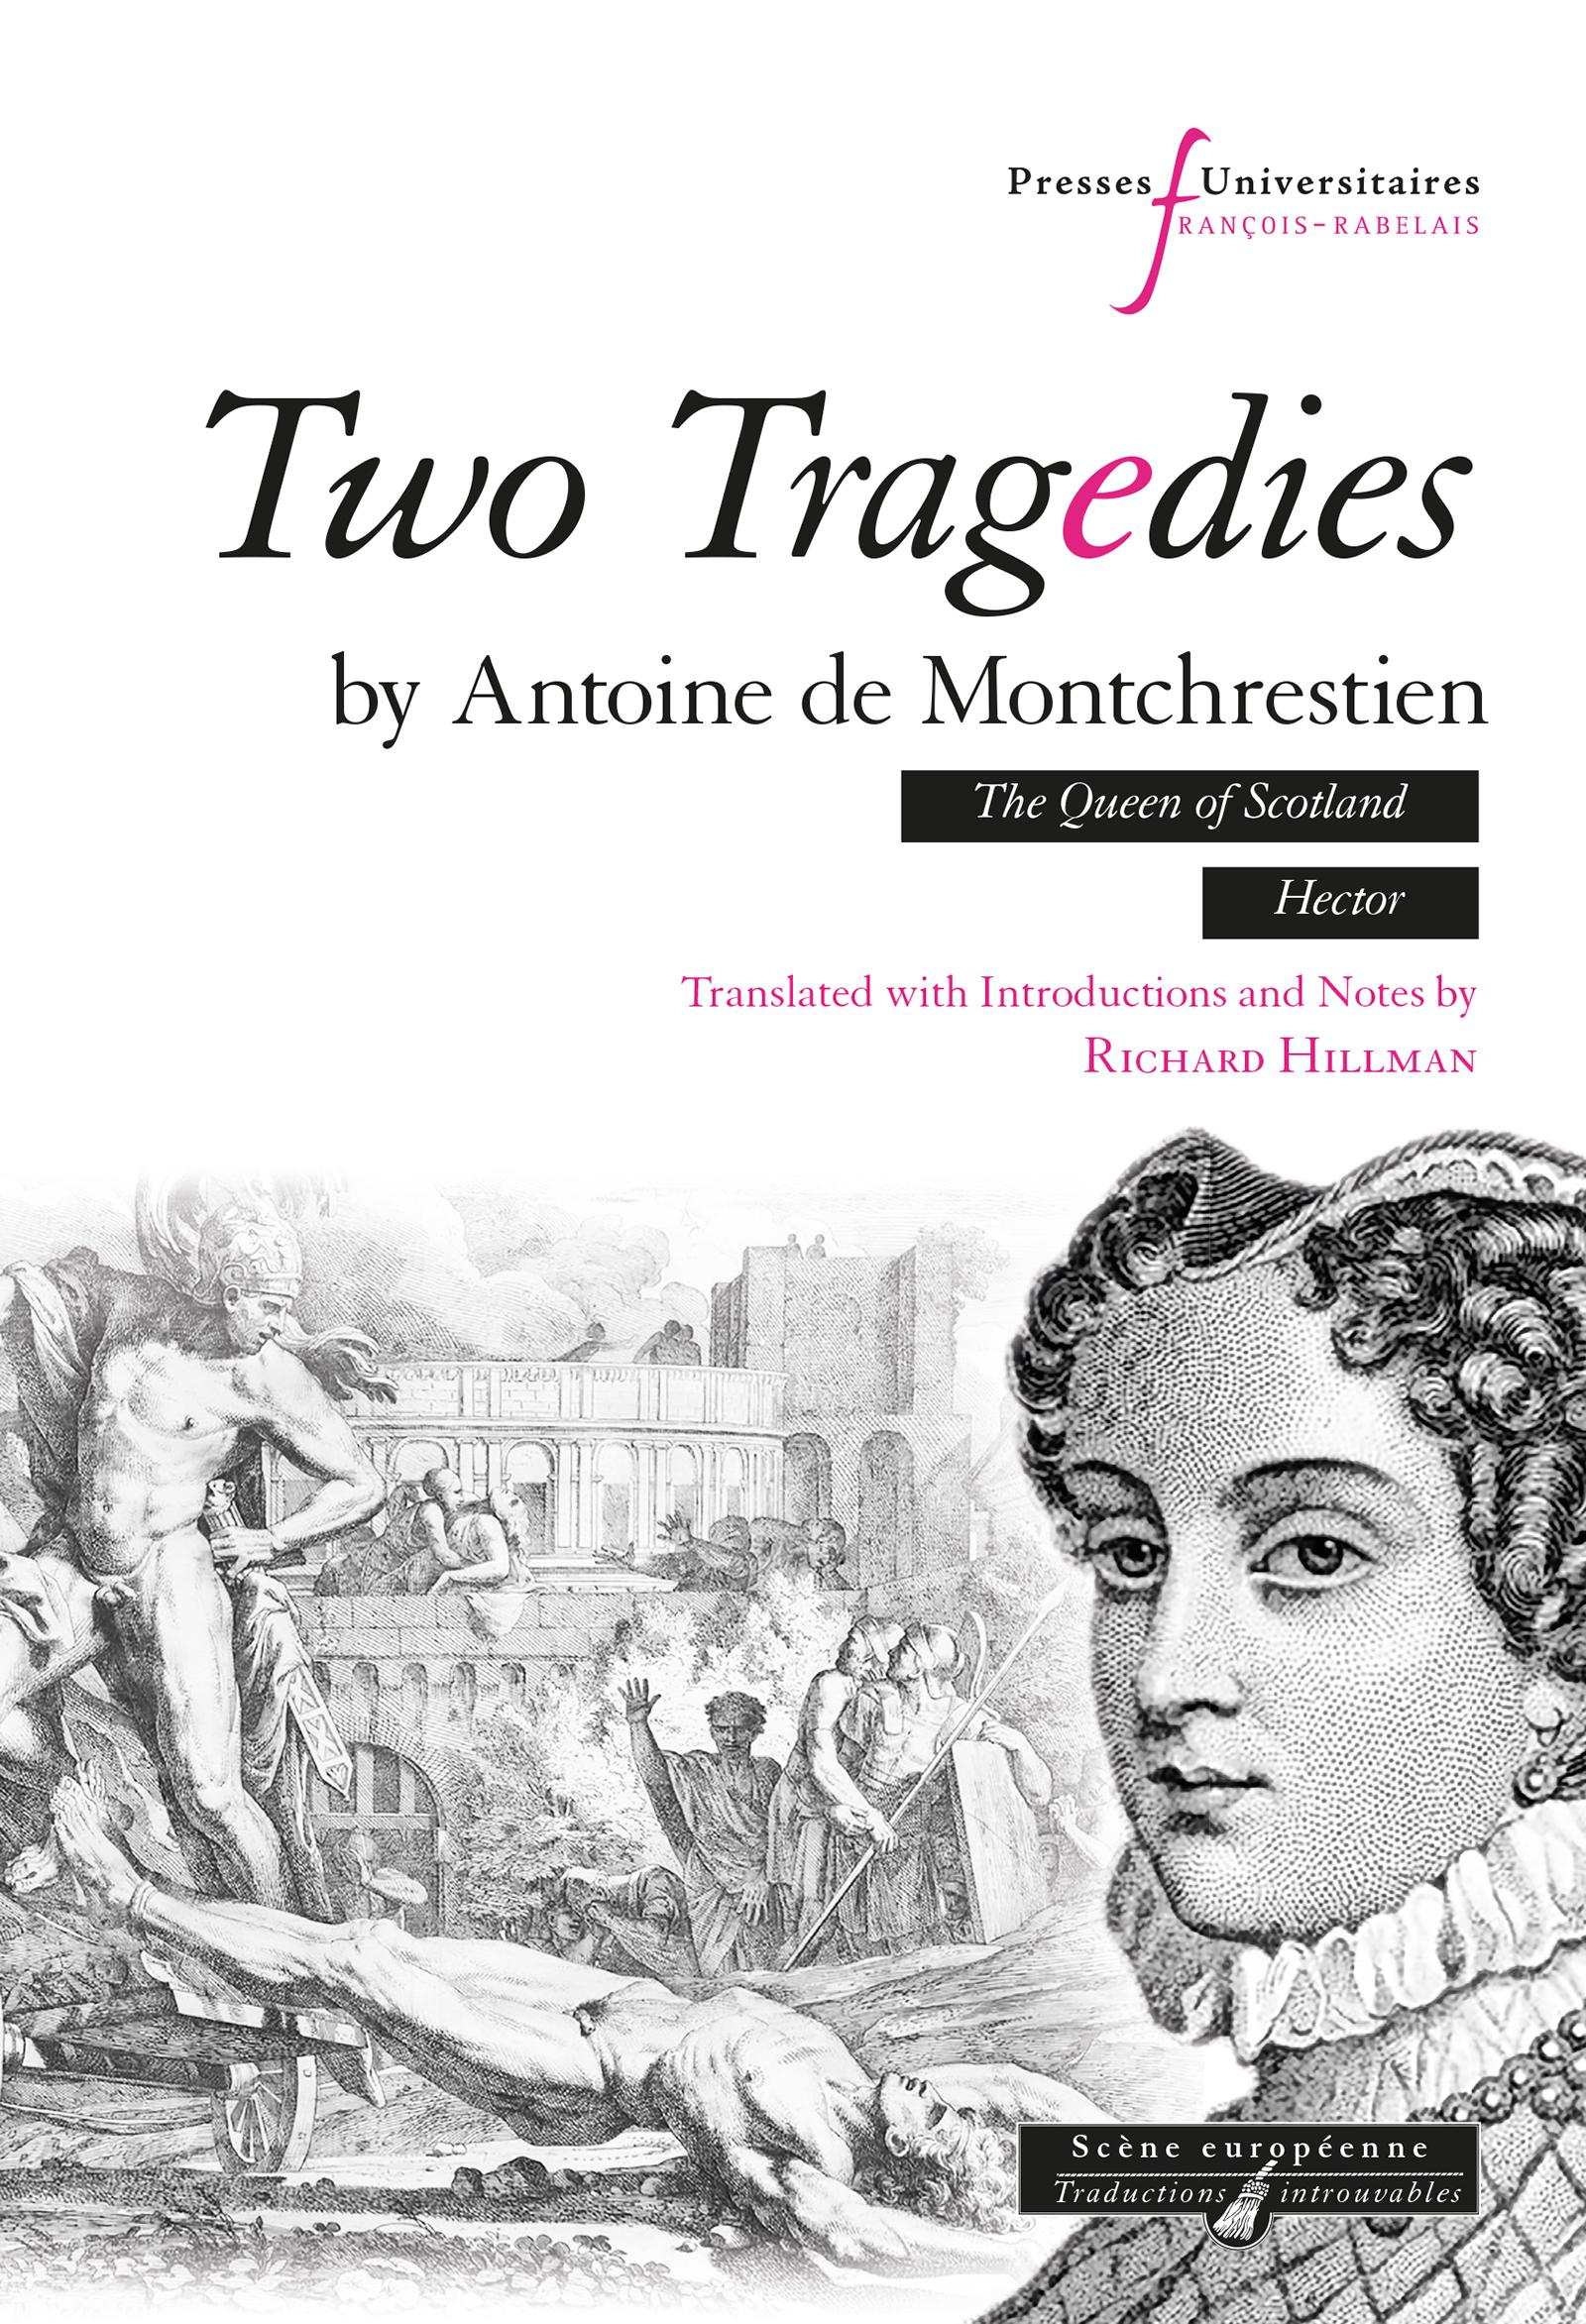 Two tragedies by Antoine de Montchrestien